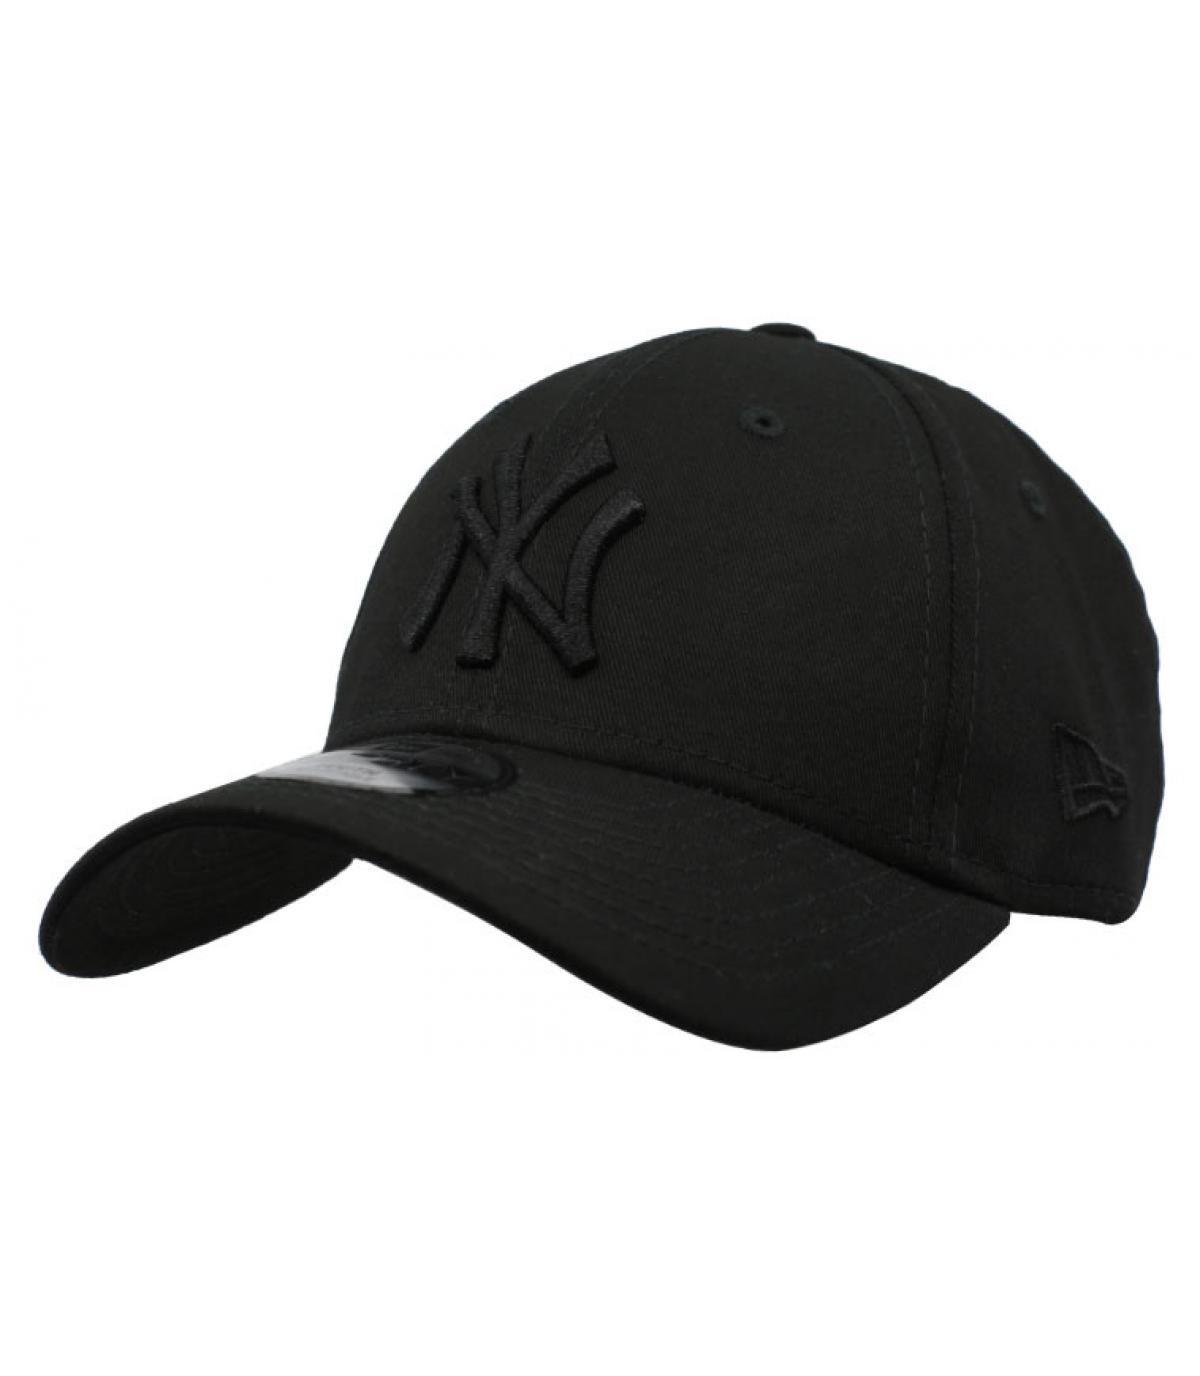 Details Cap Kids NY League Ess  9Forty black black - Abbildung 2